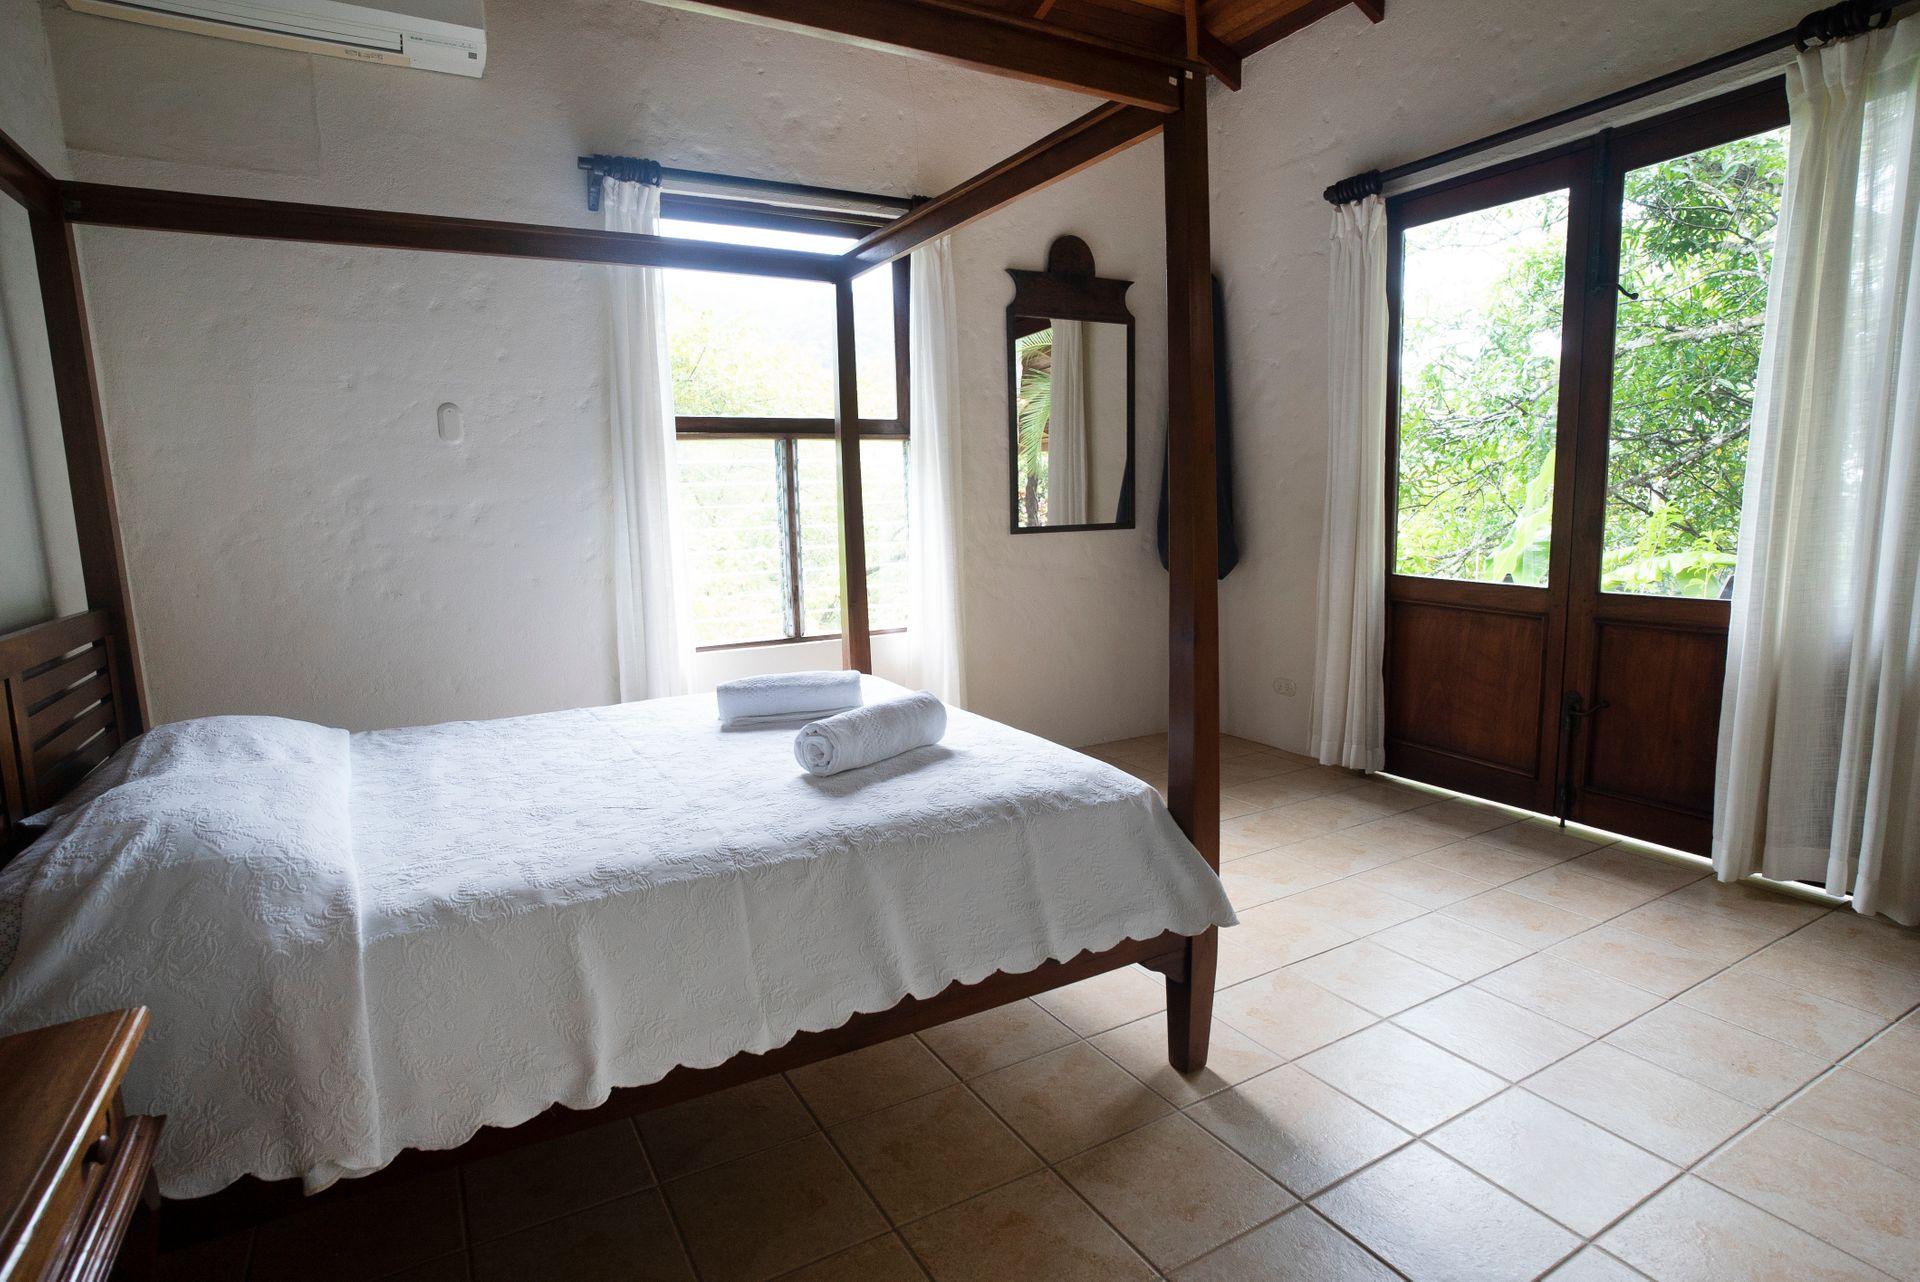 Barrigona Villa Dorada Bed